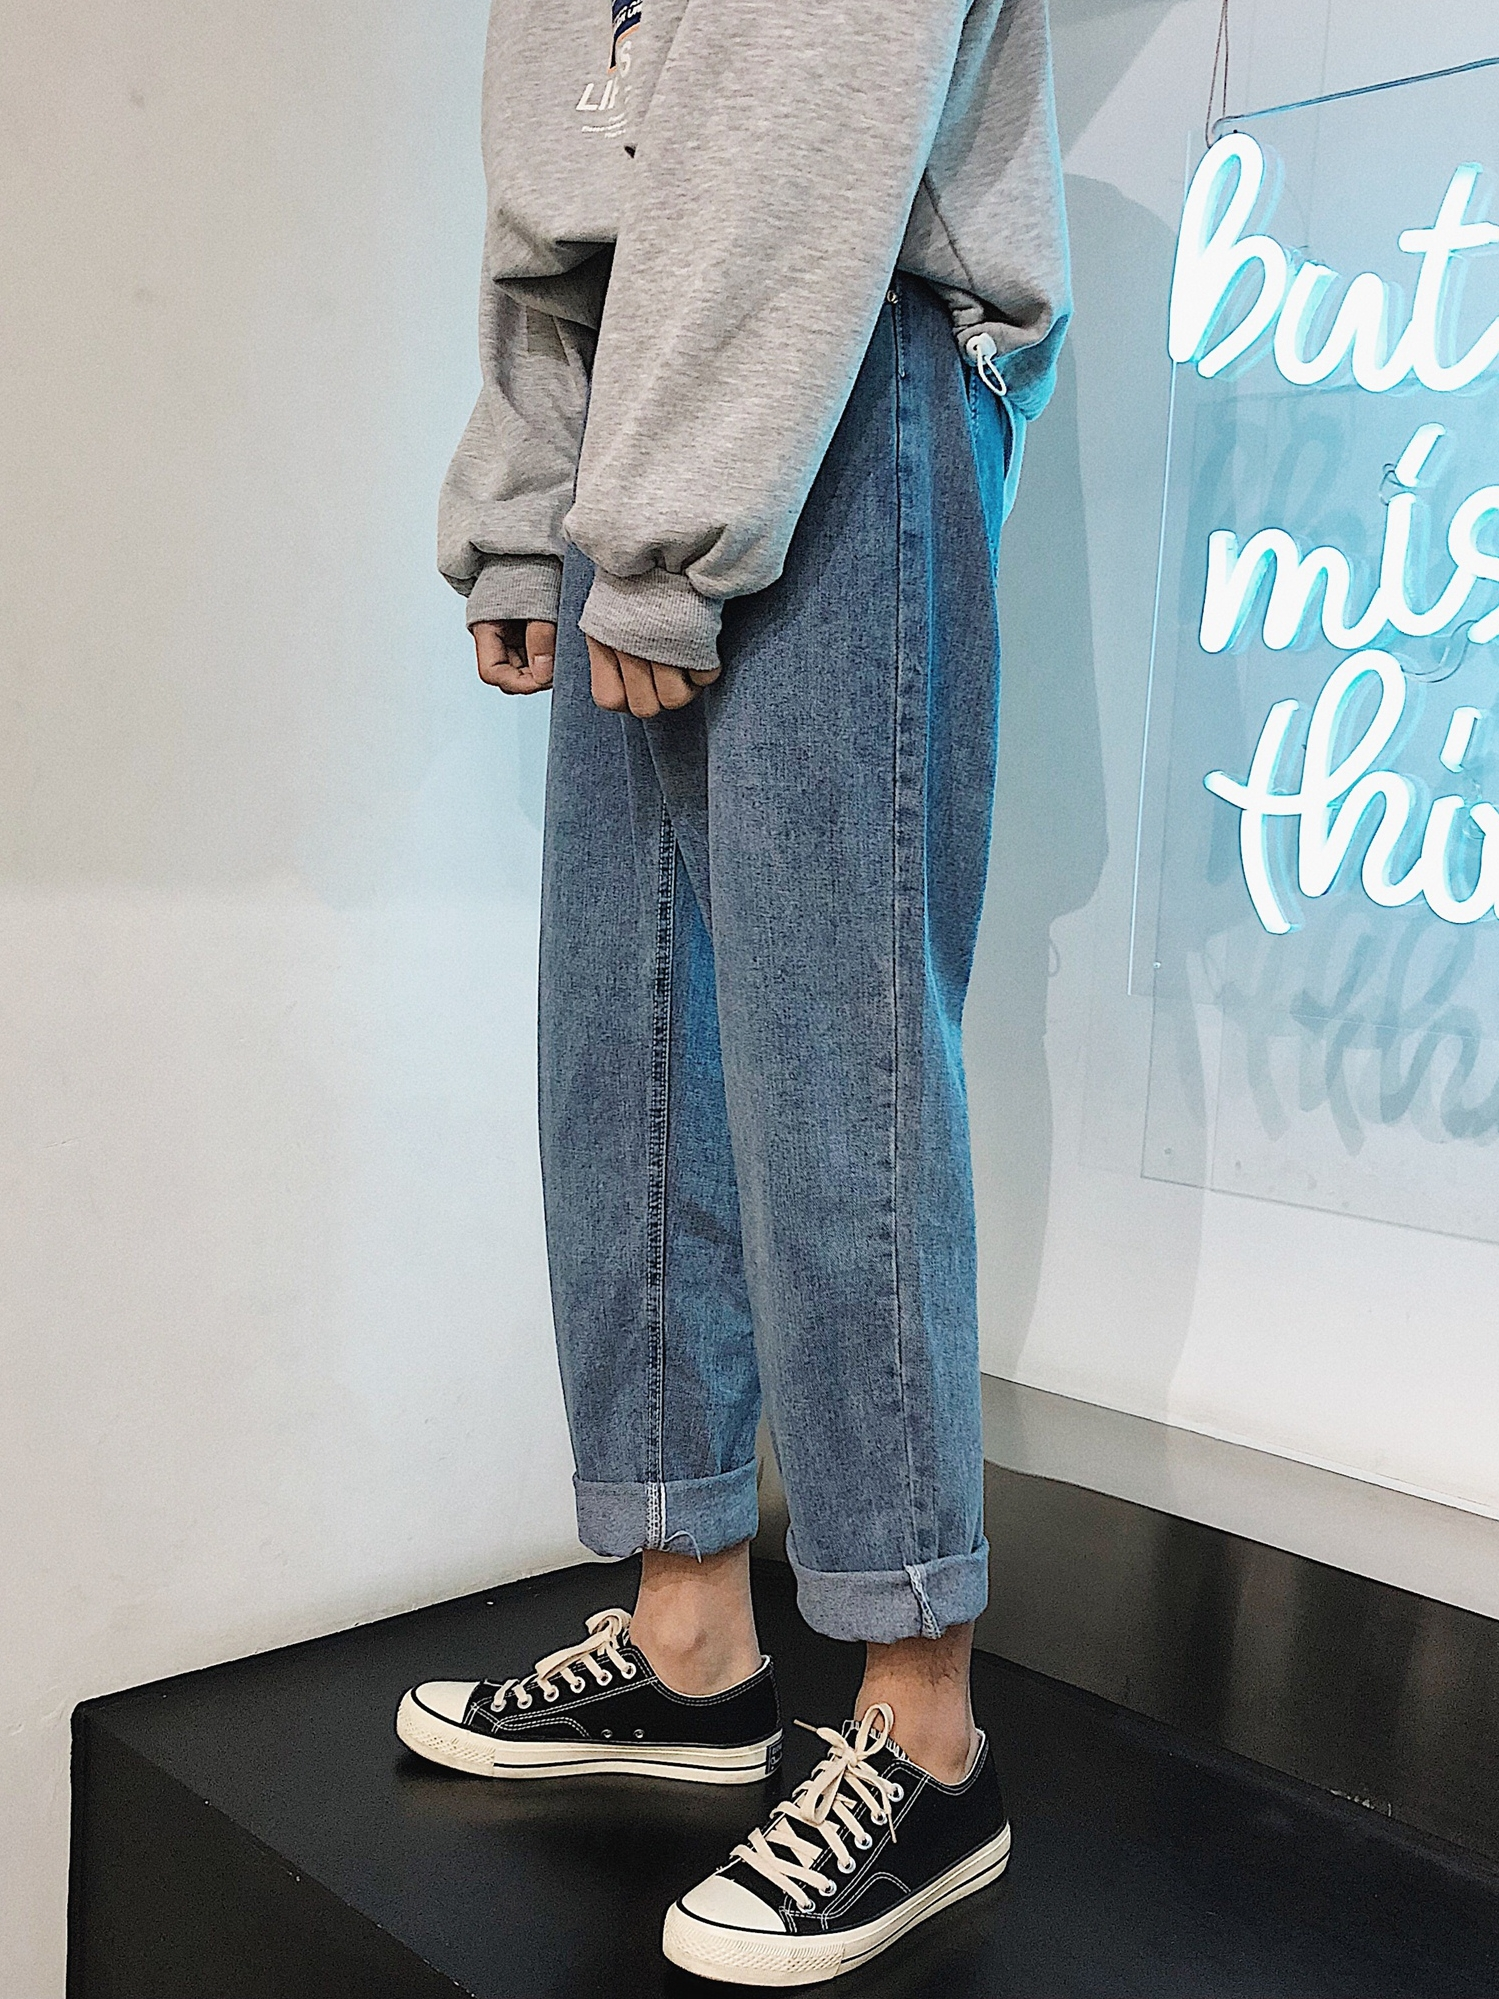 Cheap Wholesale 2019 New Autumn Winter Hot Selling Women's Fashion Casual  Denim Pants MW370